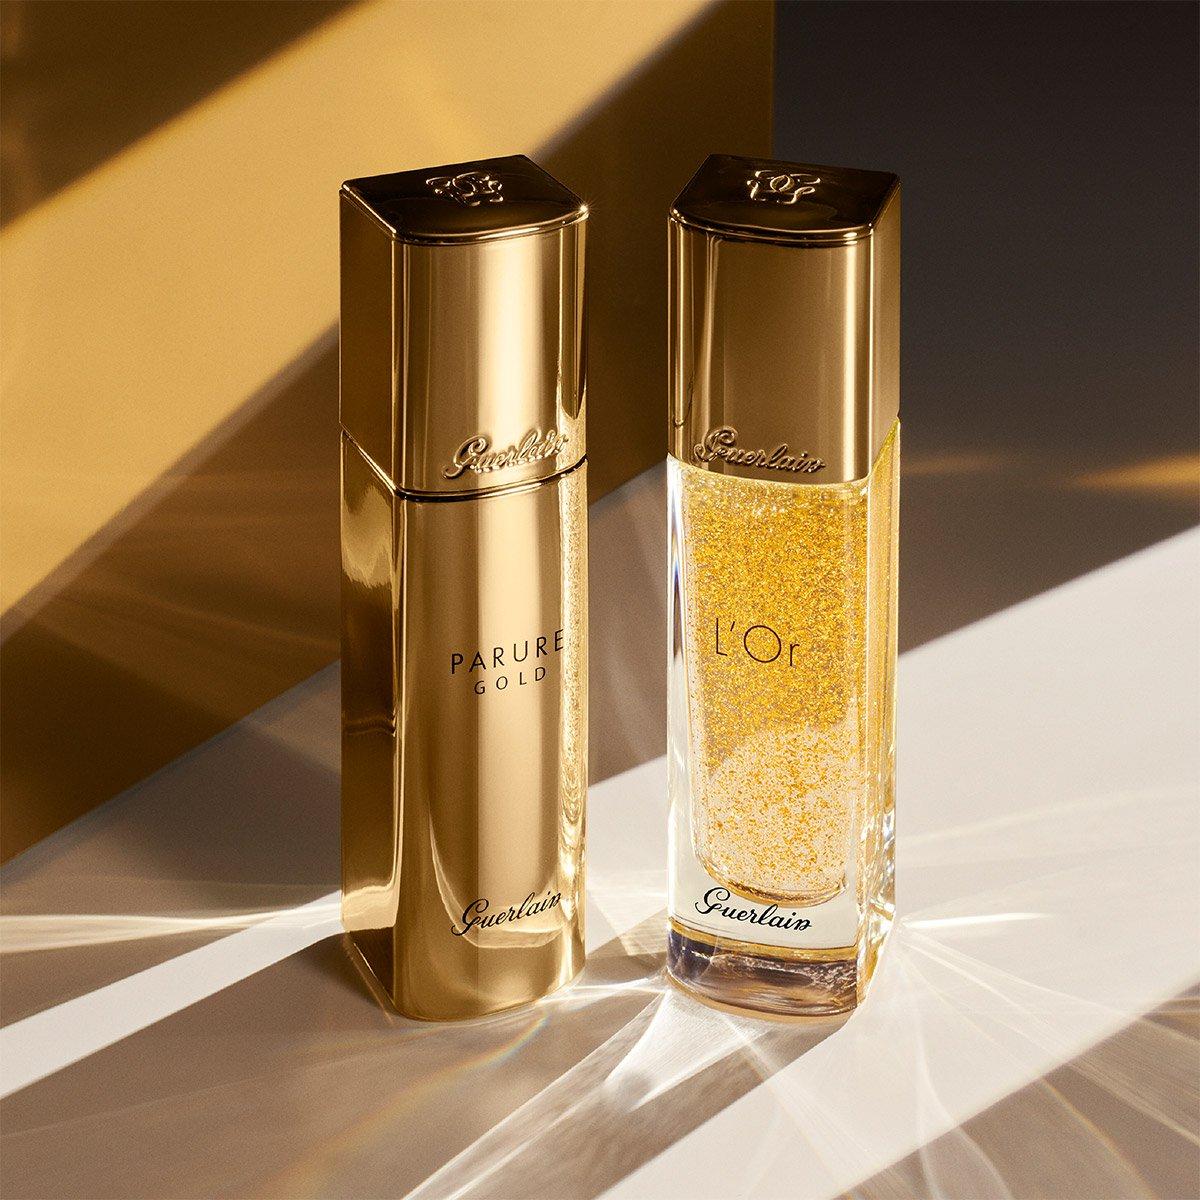 Base de Maquillaje Fluida Guerlain Parure Gold 05 Beige Fonce 30 Ml